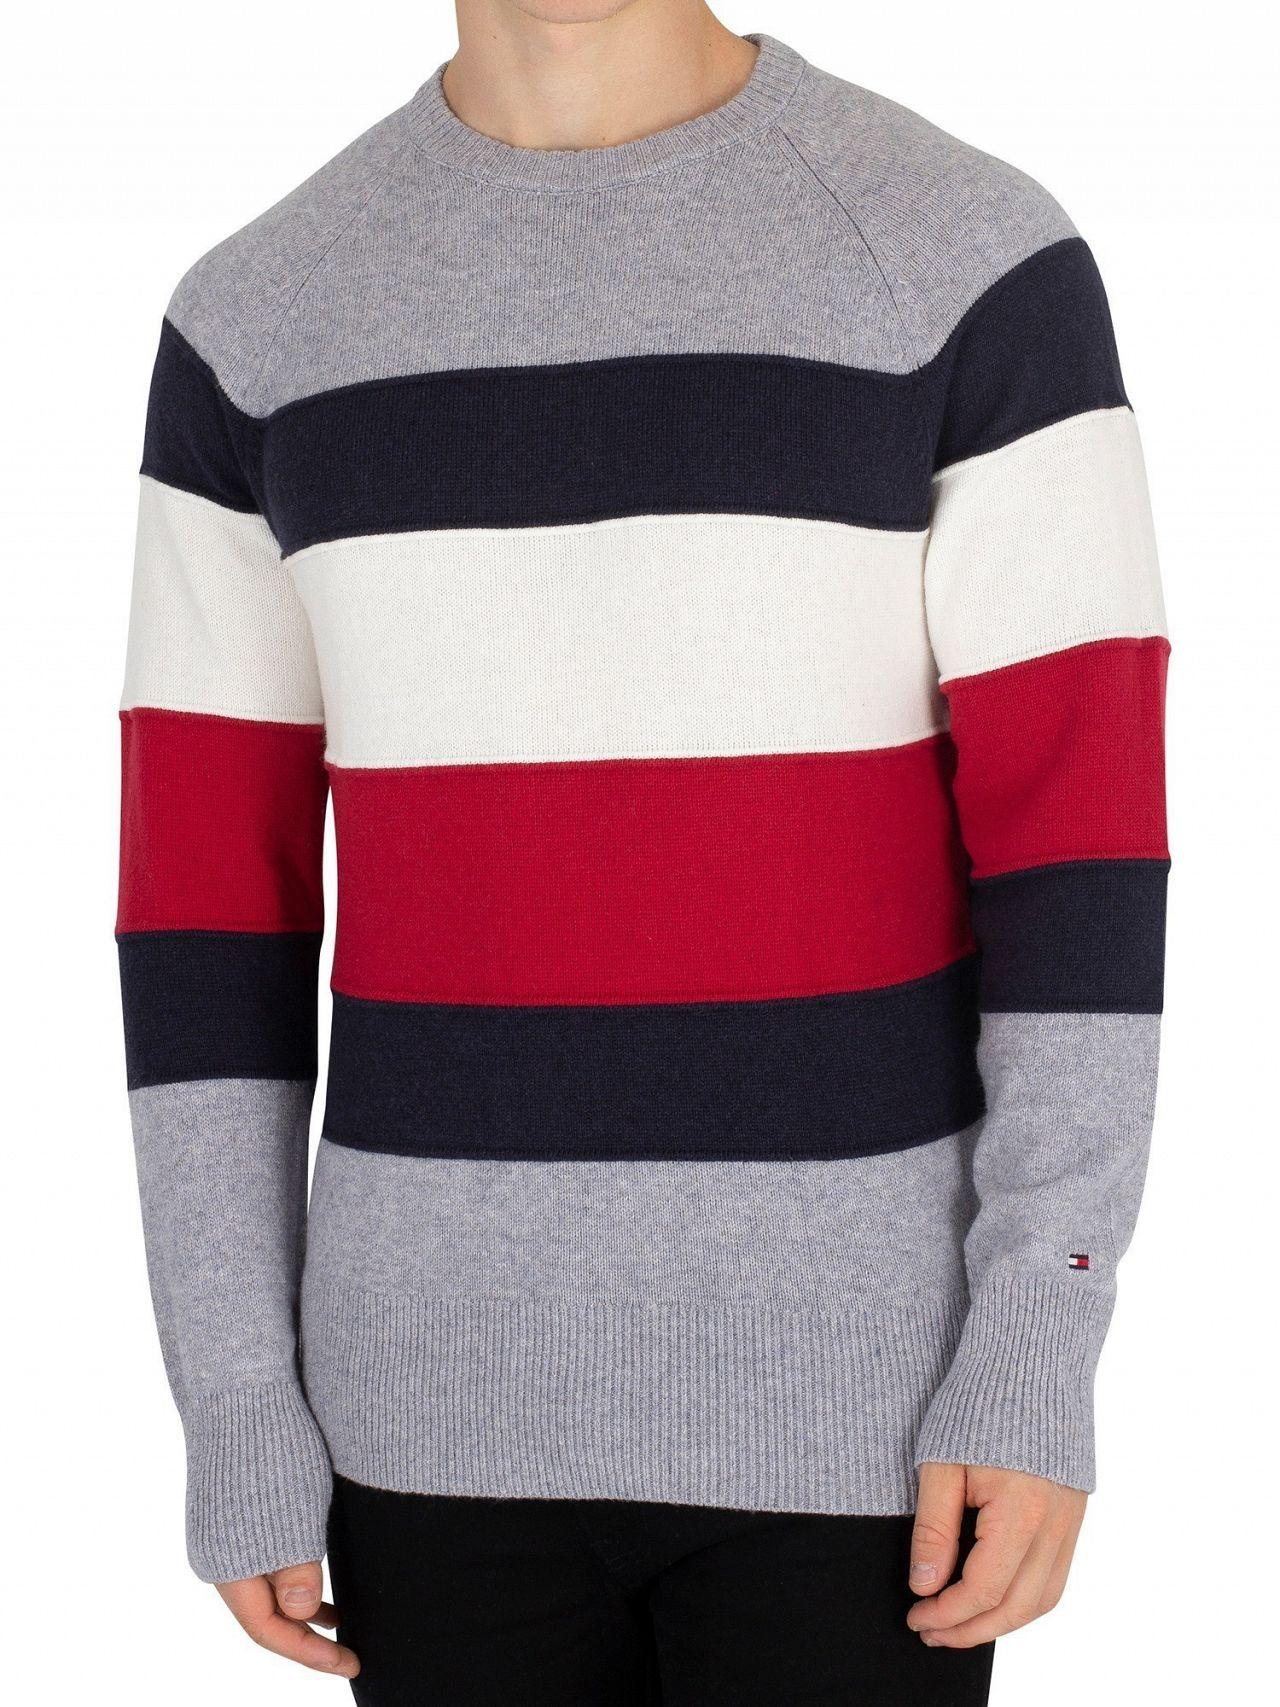 4a8a5993e68d Tommy Hilfiger Quicksilver Heather Colorblock Stripe Knit